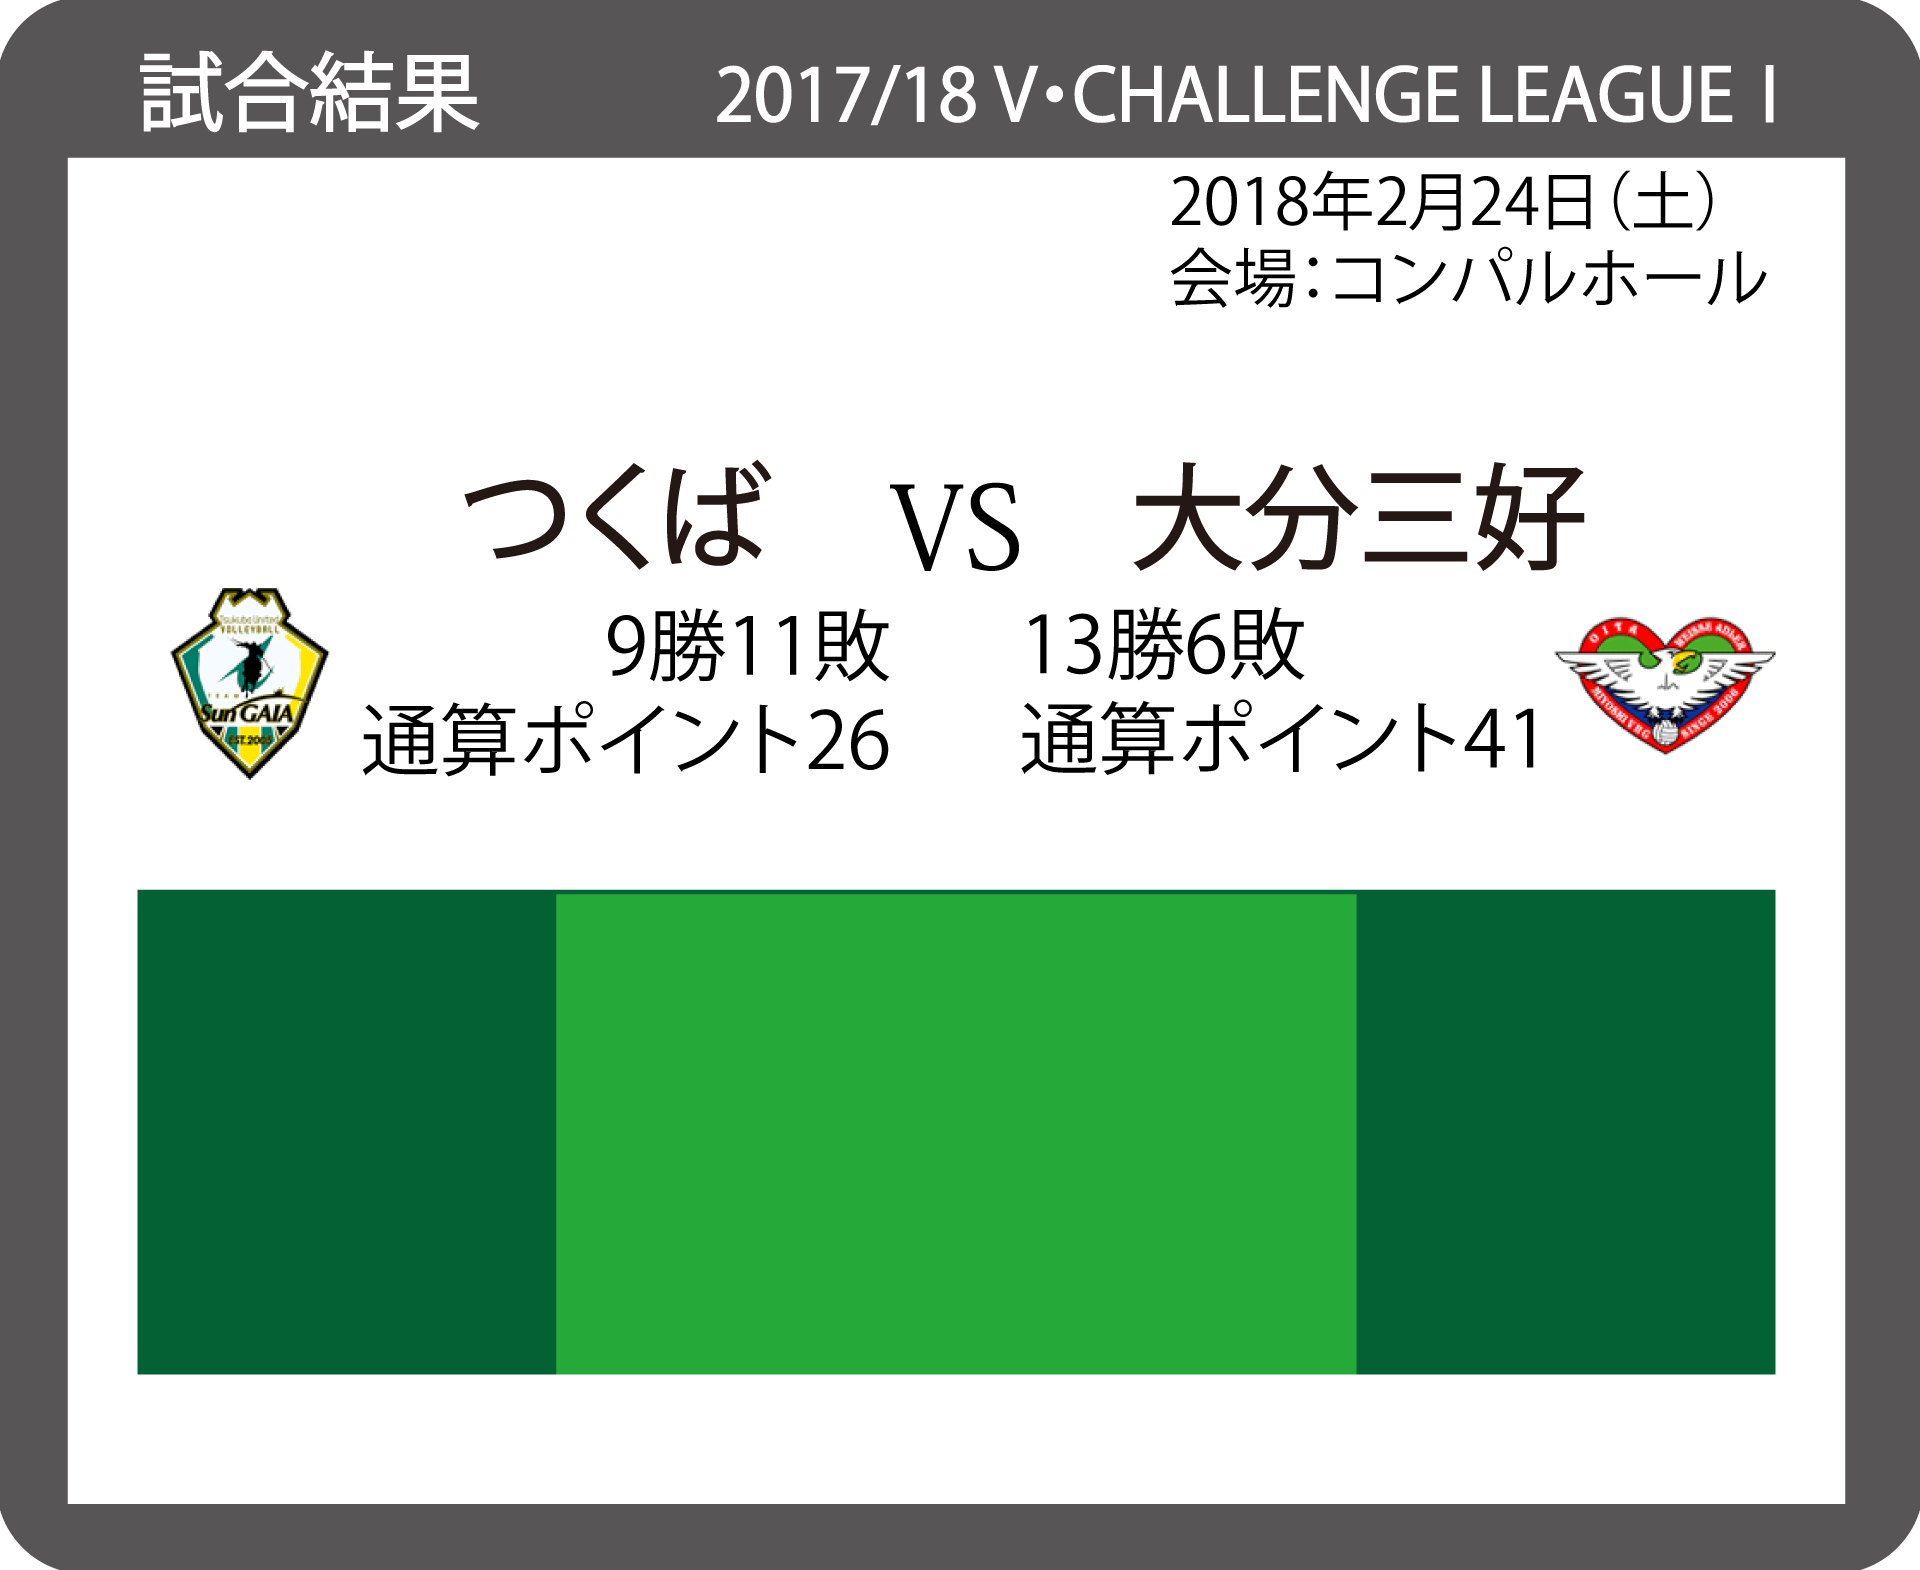 2017/18 V・チャレンジリーグⅠ 男子バレーボール 20180224_VS_大分三好